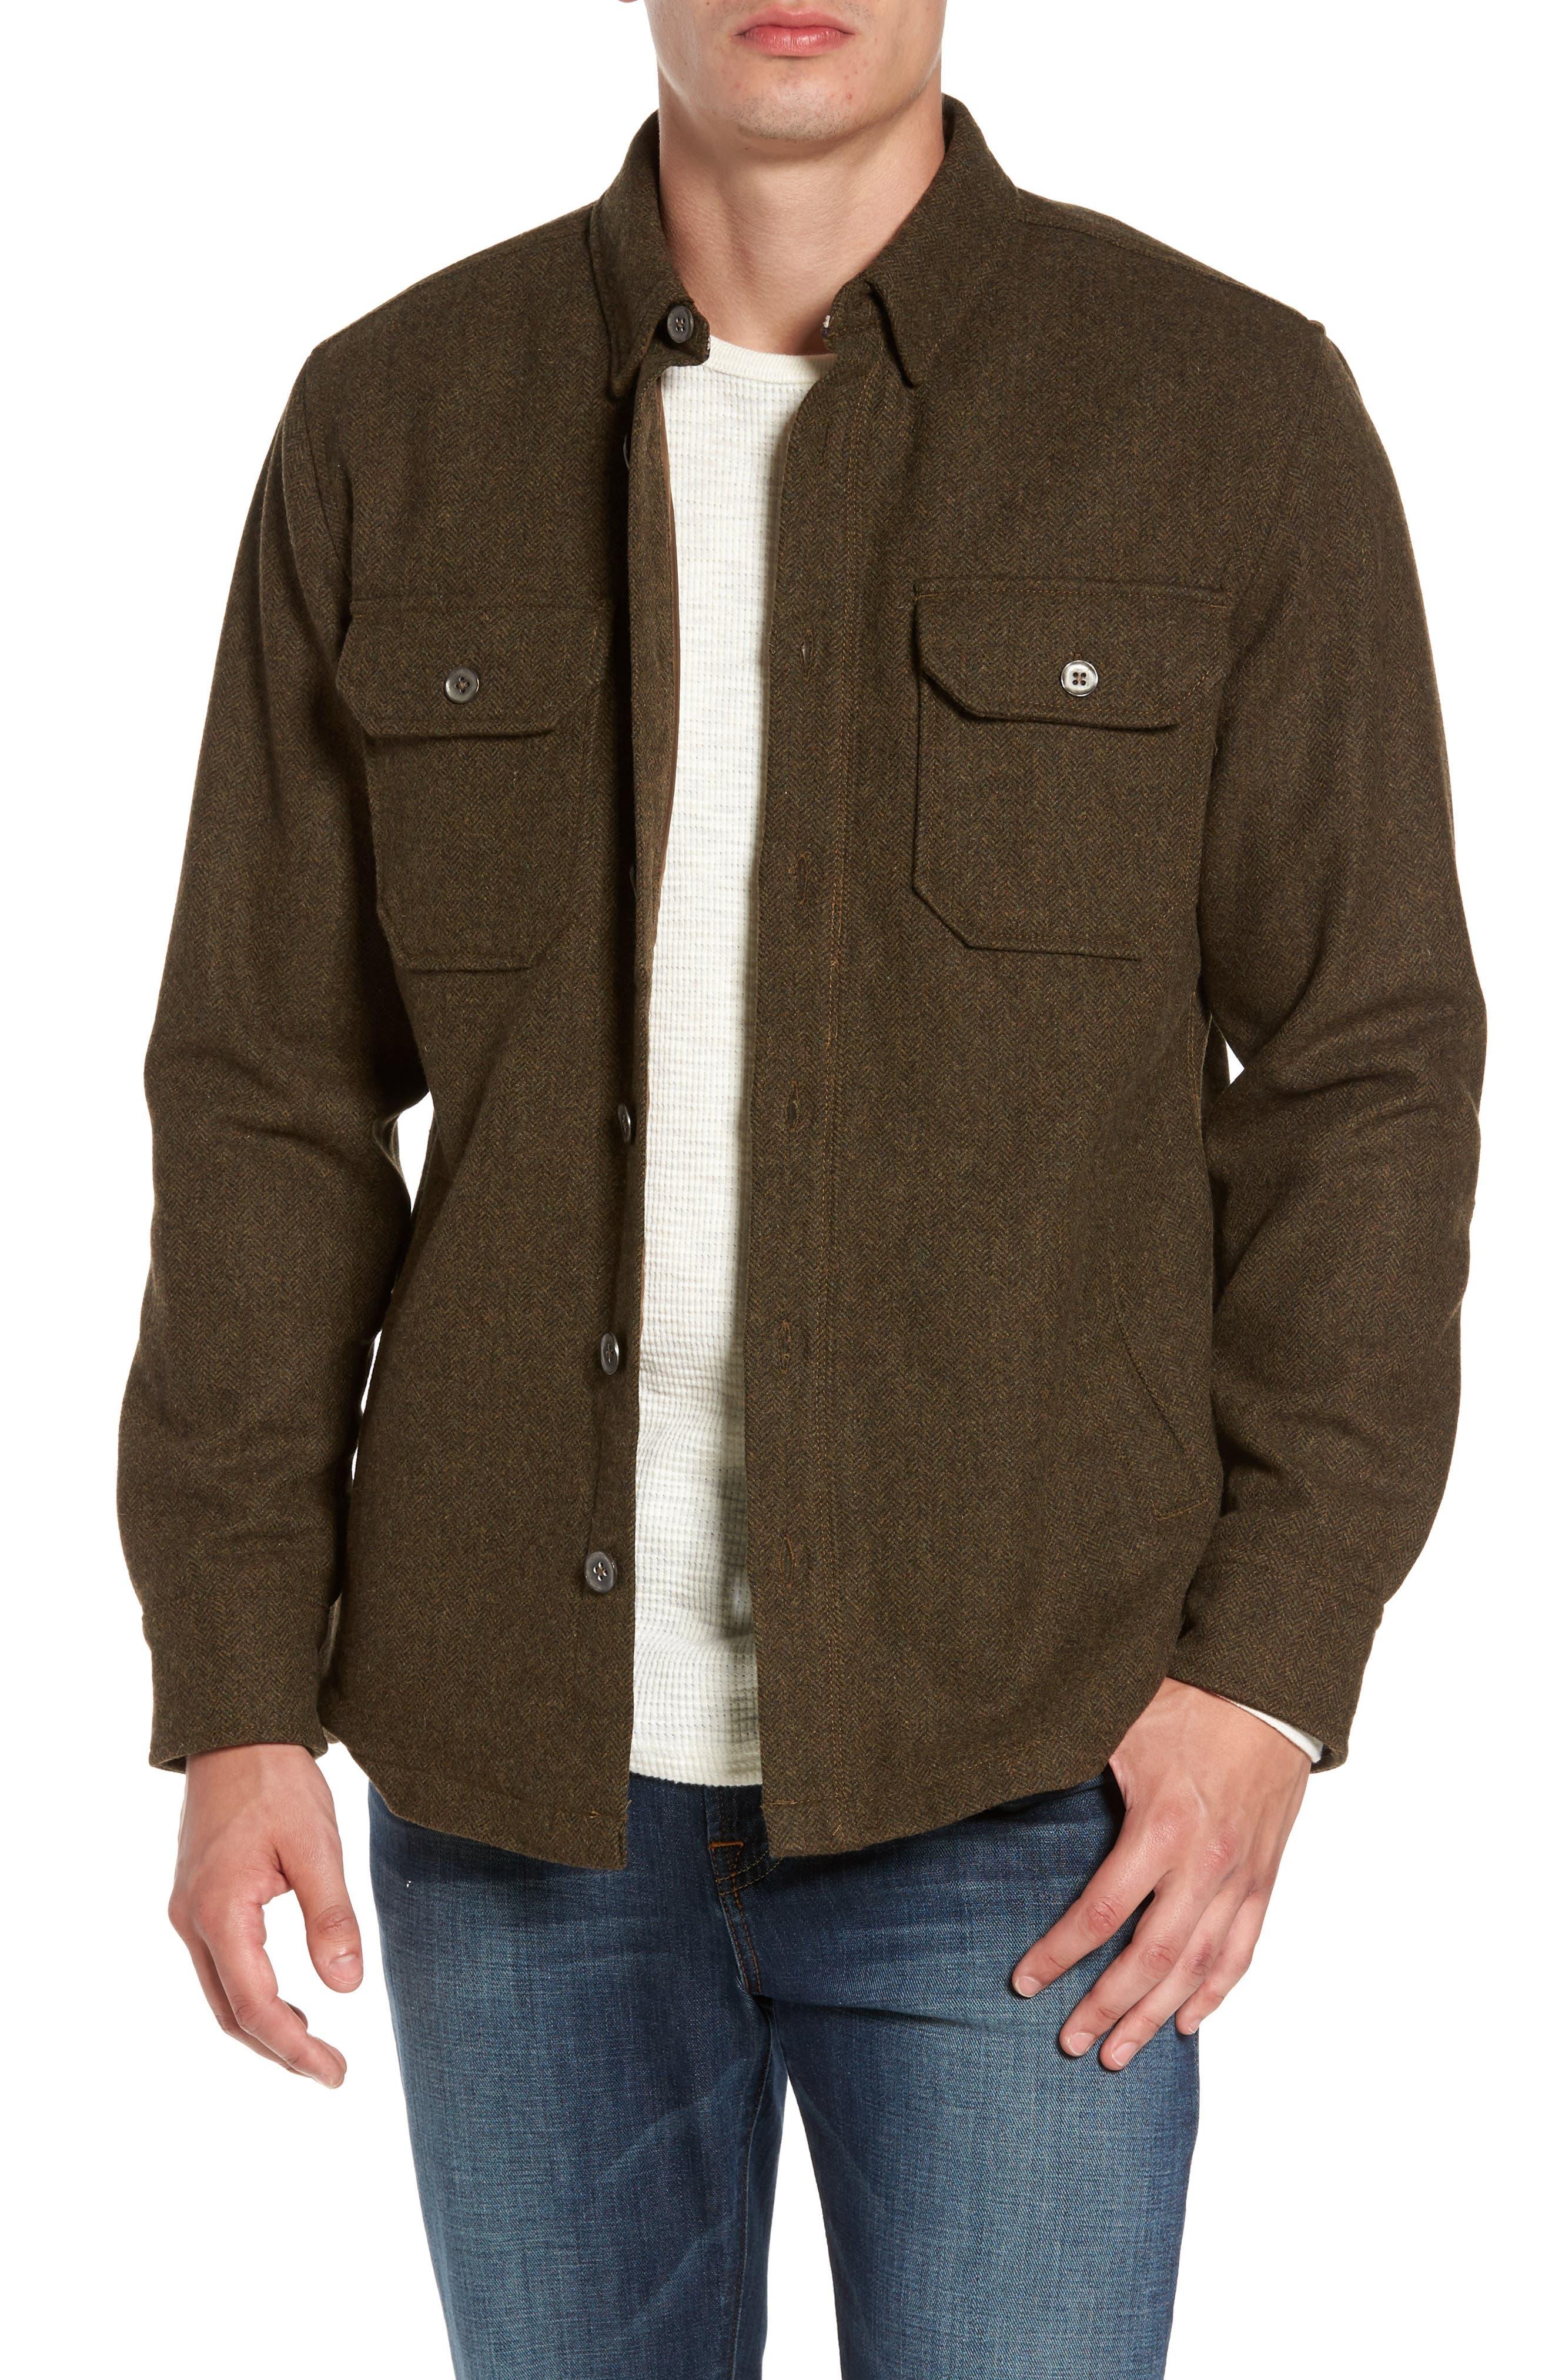 Jeremiah Creek Herringbone Wool Shirt Jacket